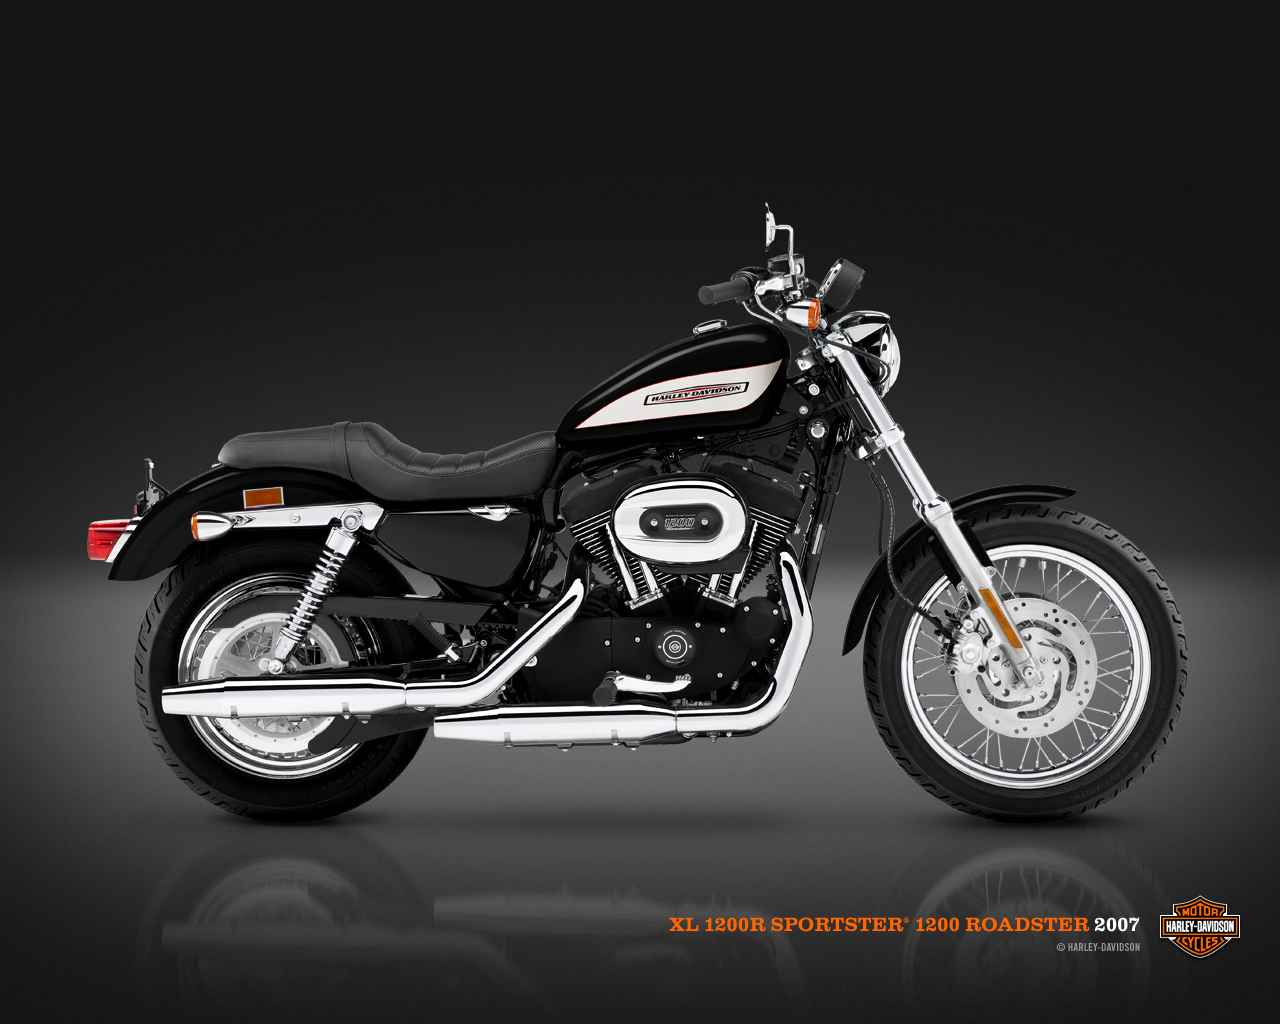 Couleurs 1200 Roadster Harley Davidson 2007